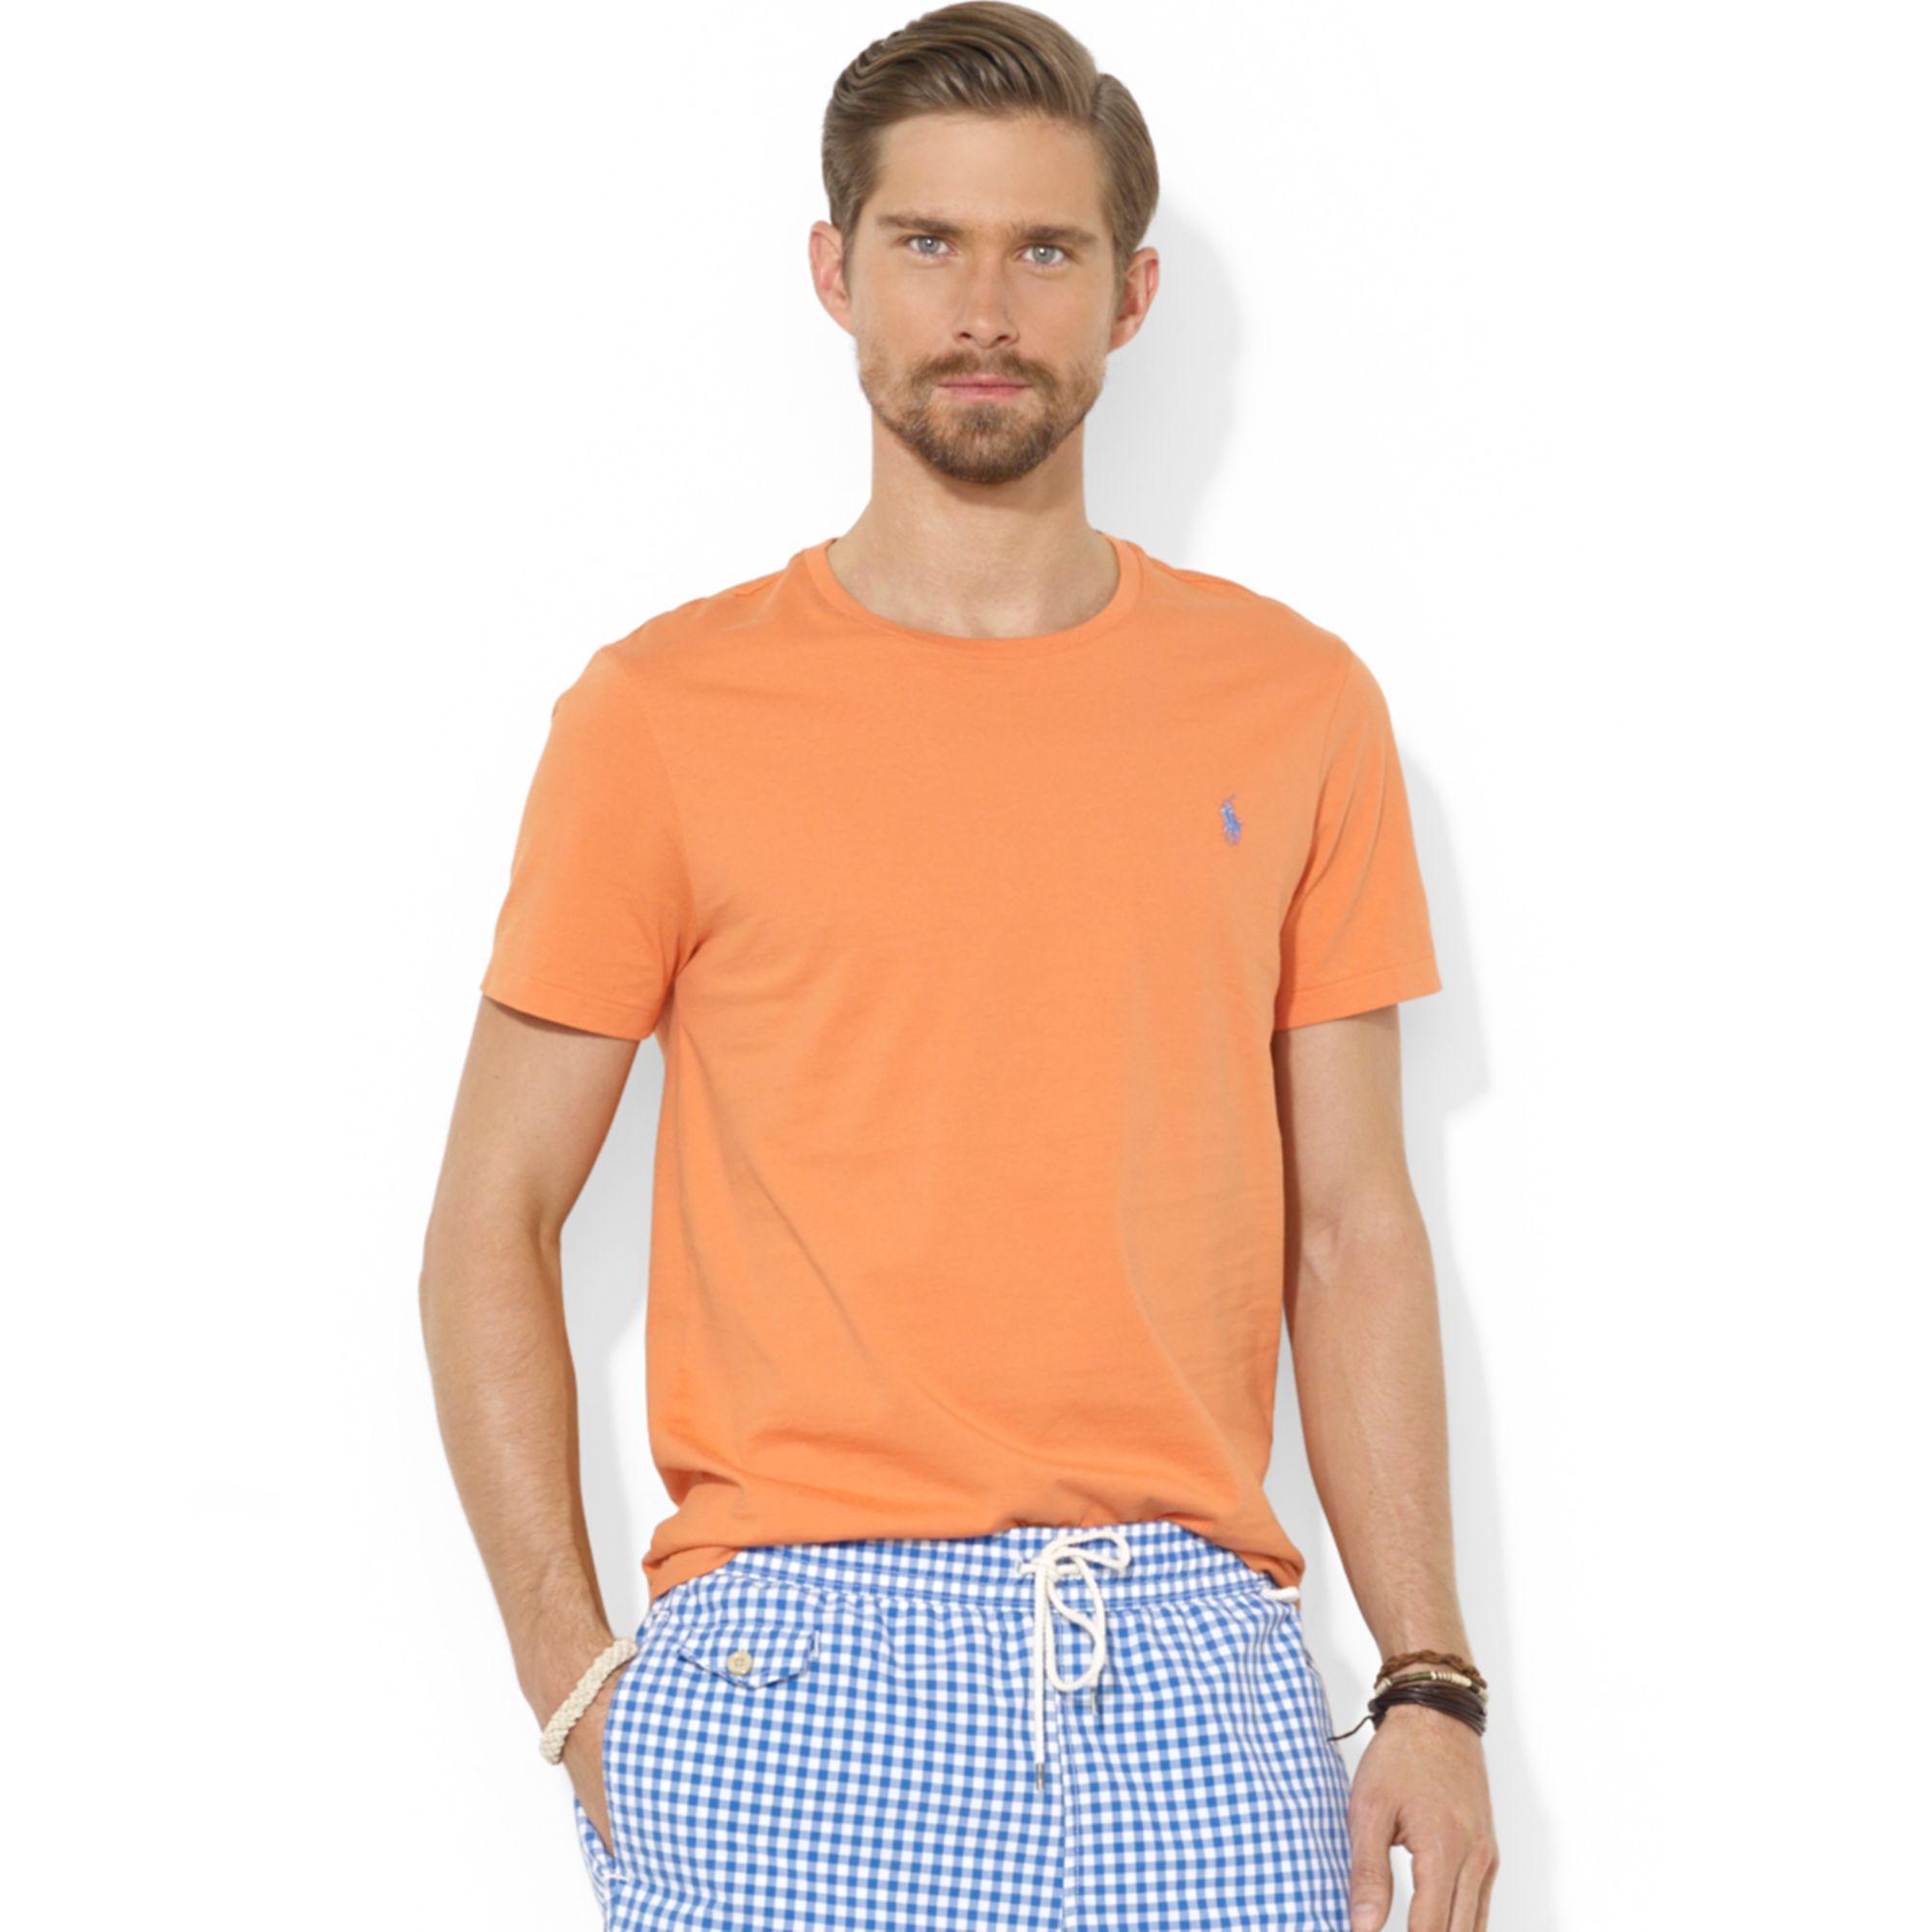 Ralph lauren polo custom fit cotton jersey t shirt in for Ralph lauren polo jersey shirt